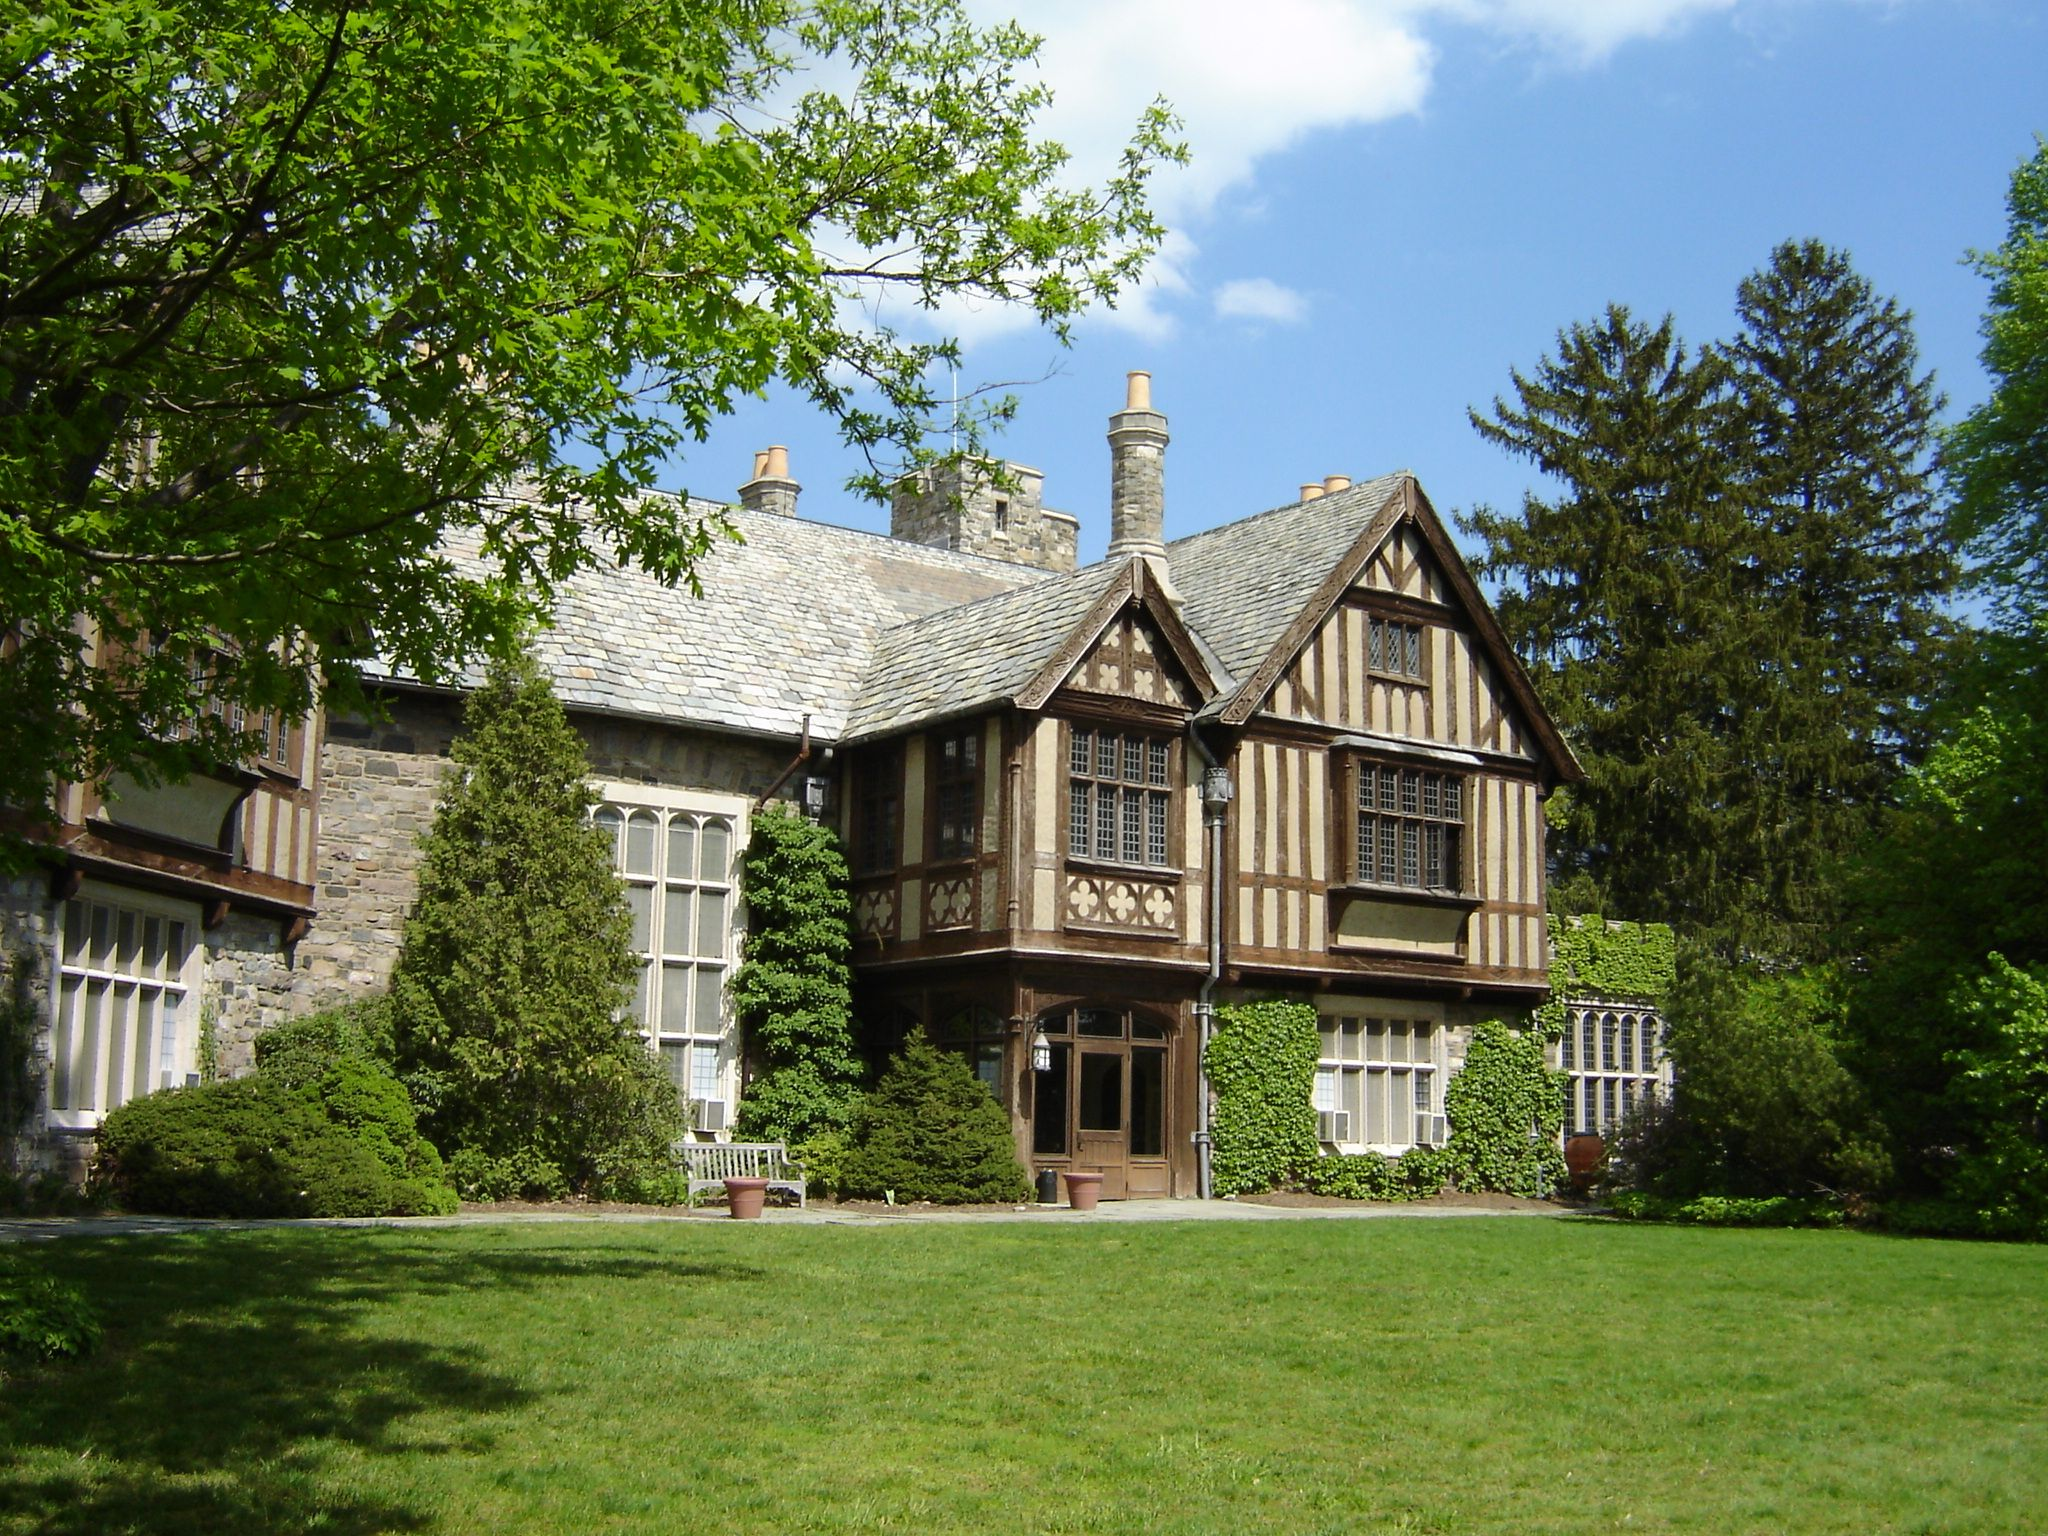 American Auto Sales Of Skyland: Skylands Manor. Historic Tudor Revival Mansion, New Jersey